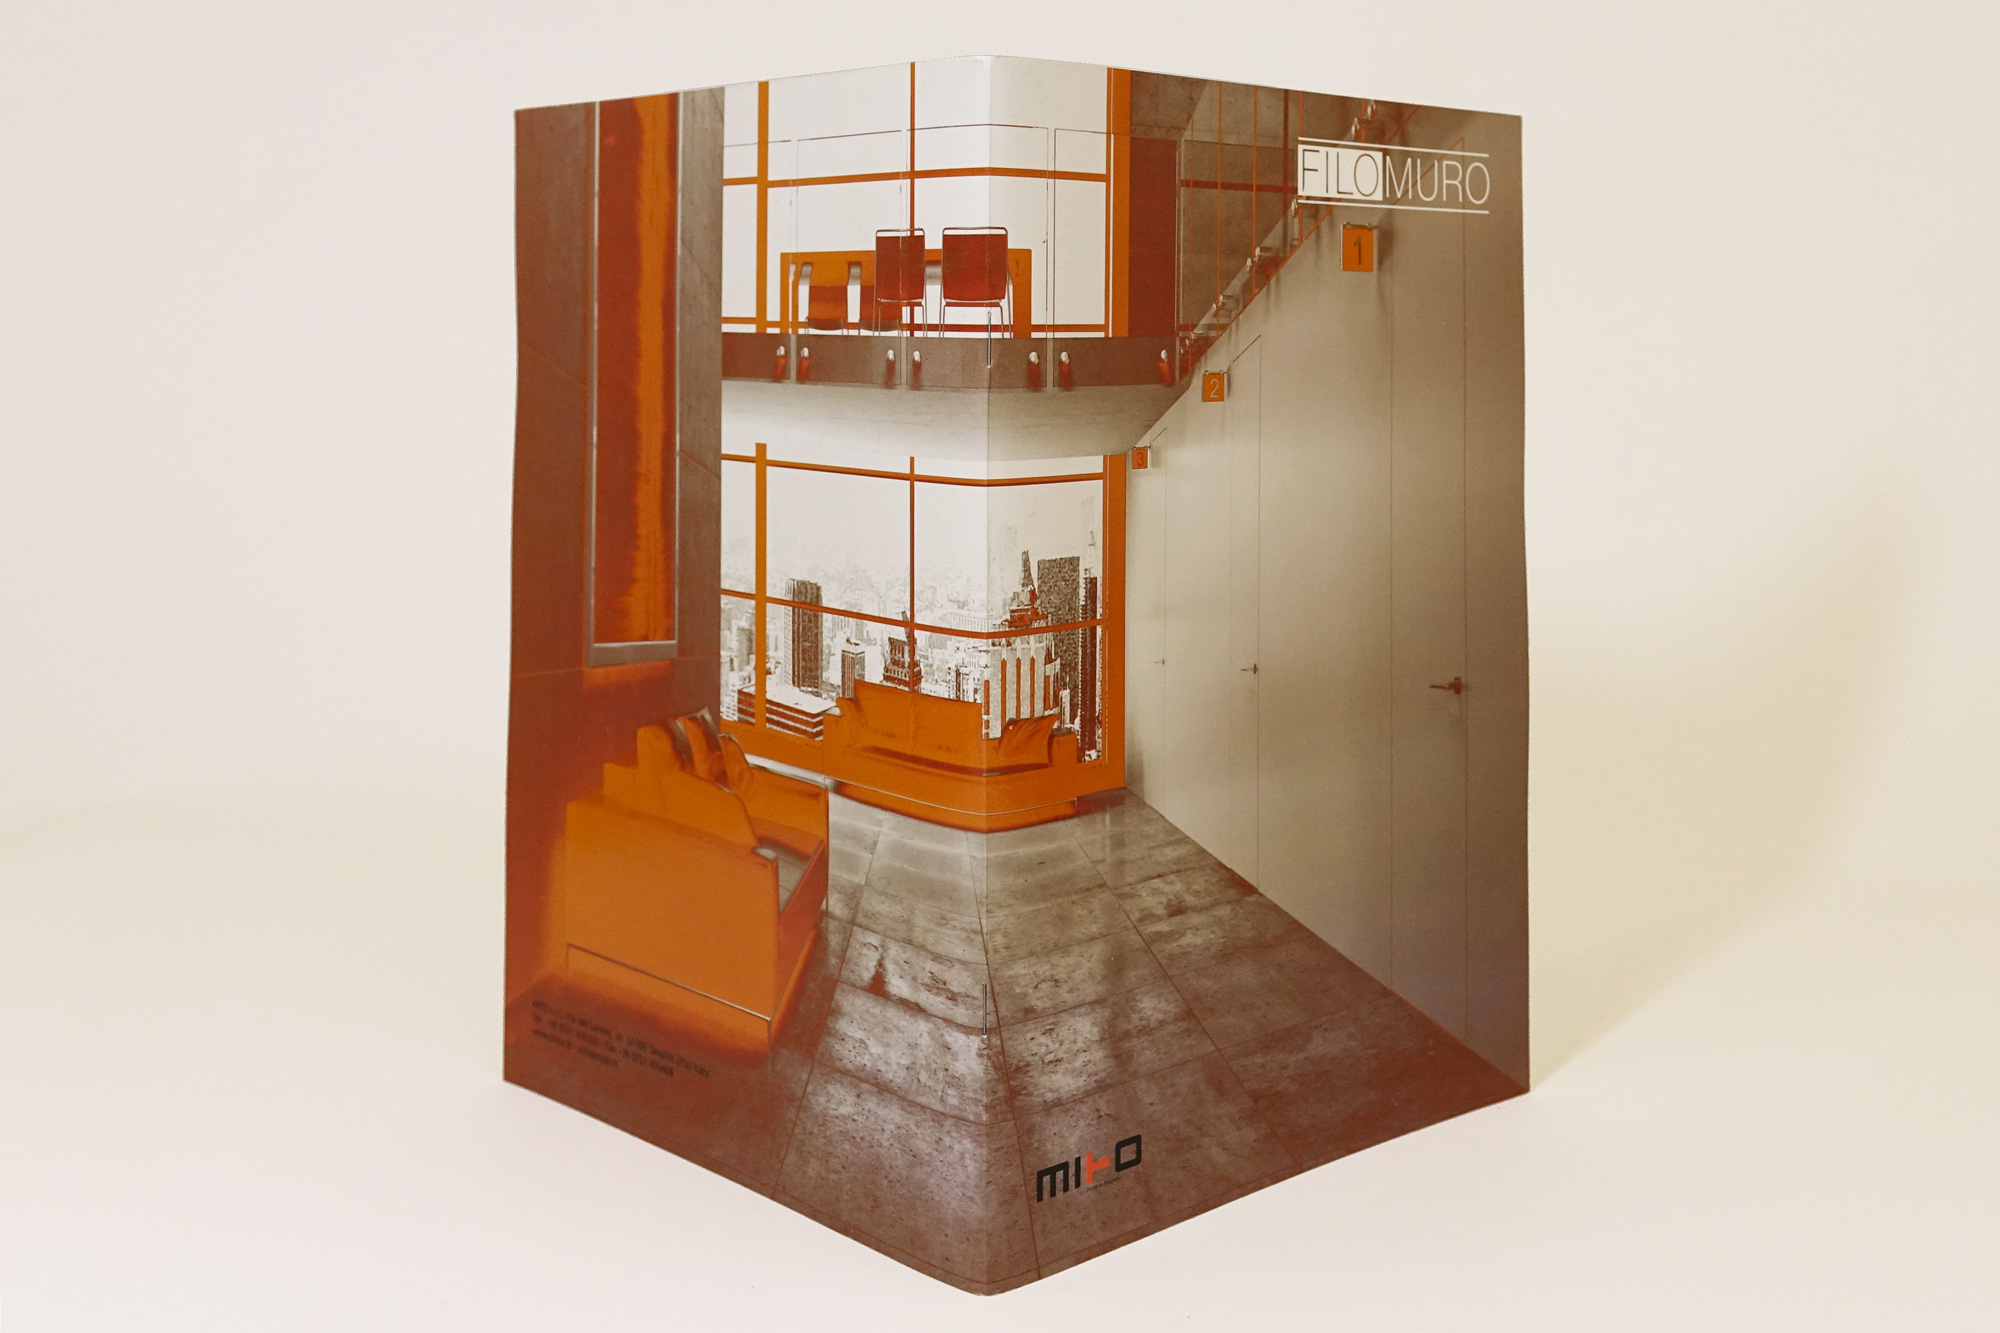 studio bartolini cataloghi grafici rendering 3D Filomuro doors security catalogo porte maniglie inferiate ante chiudiporta Tavullia Pesaro Urbino aperto